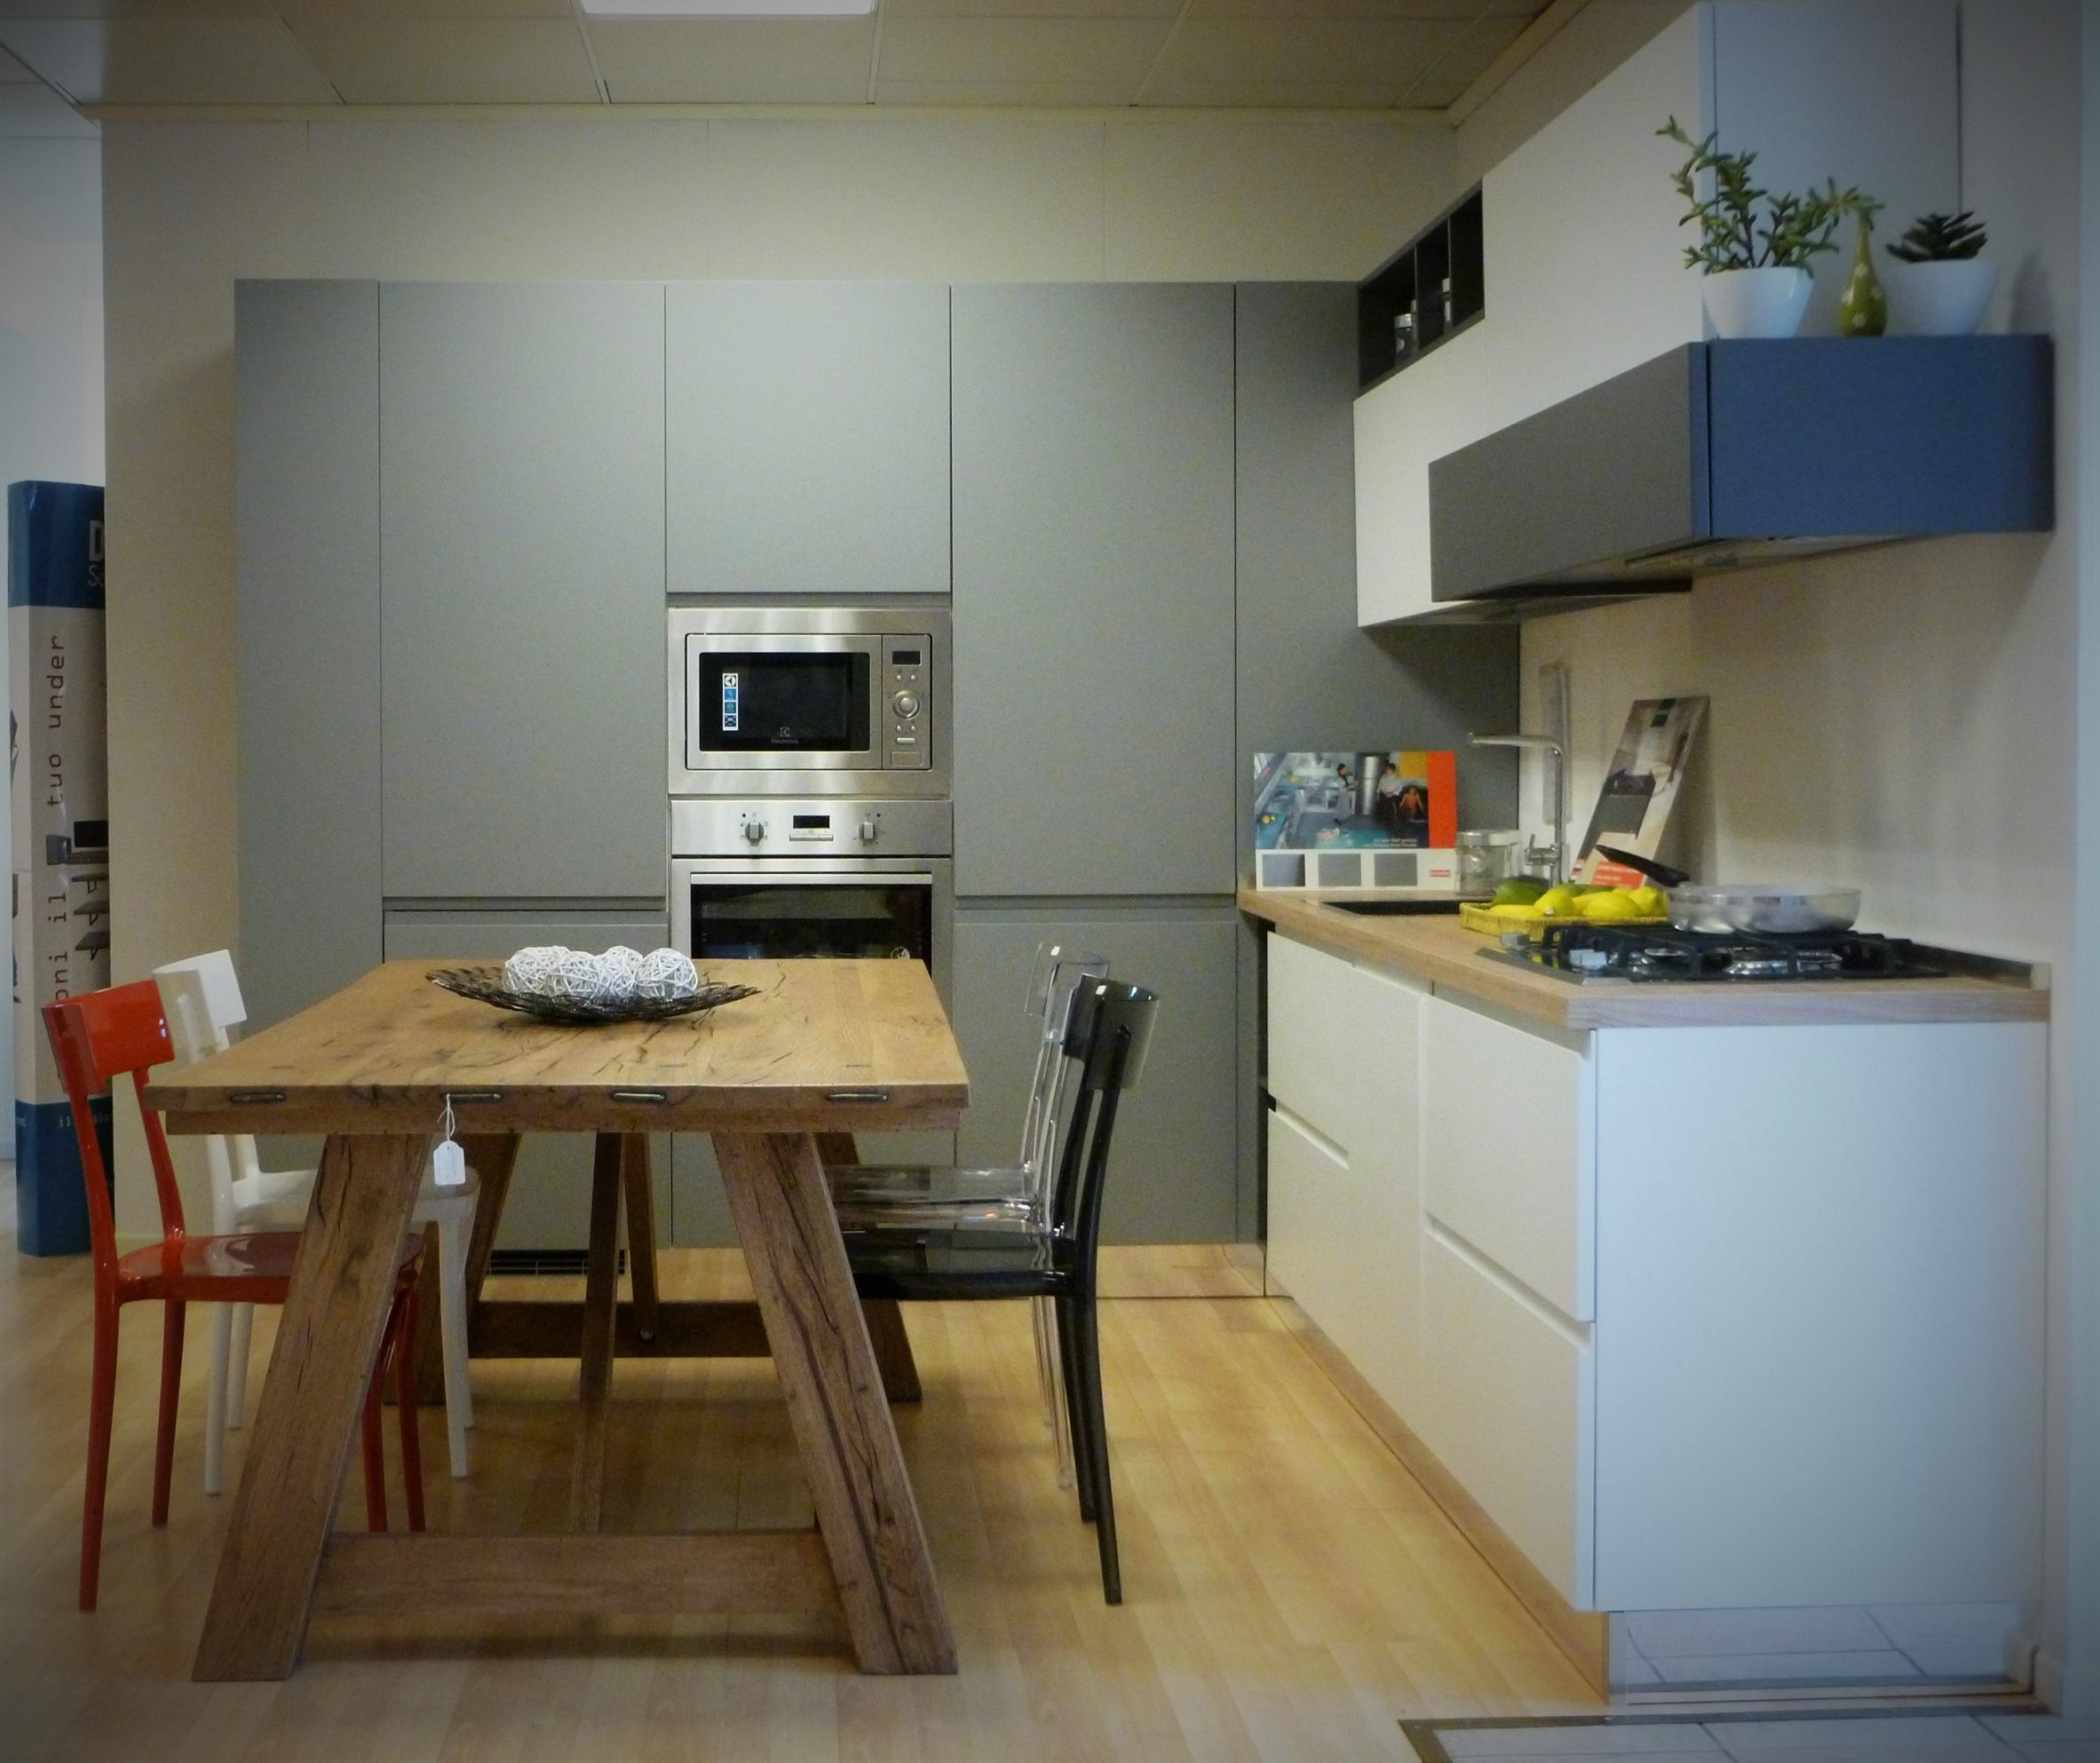 Cucina arredo3 wega moderno laccate opaco bianca cucine for Cucina verona arredo 3